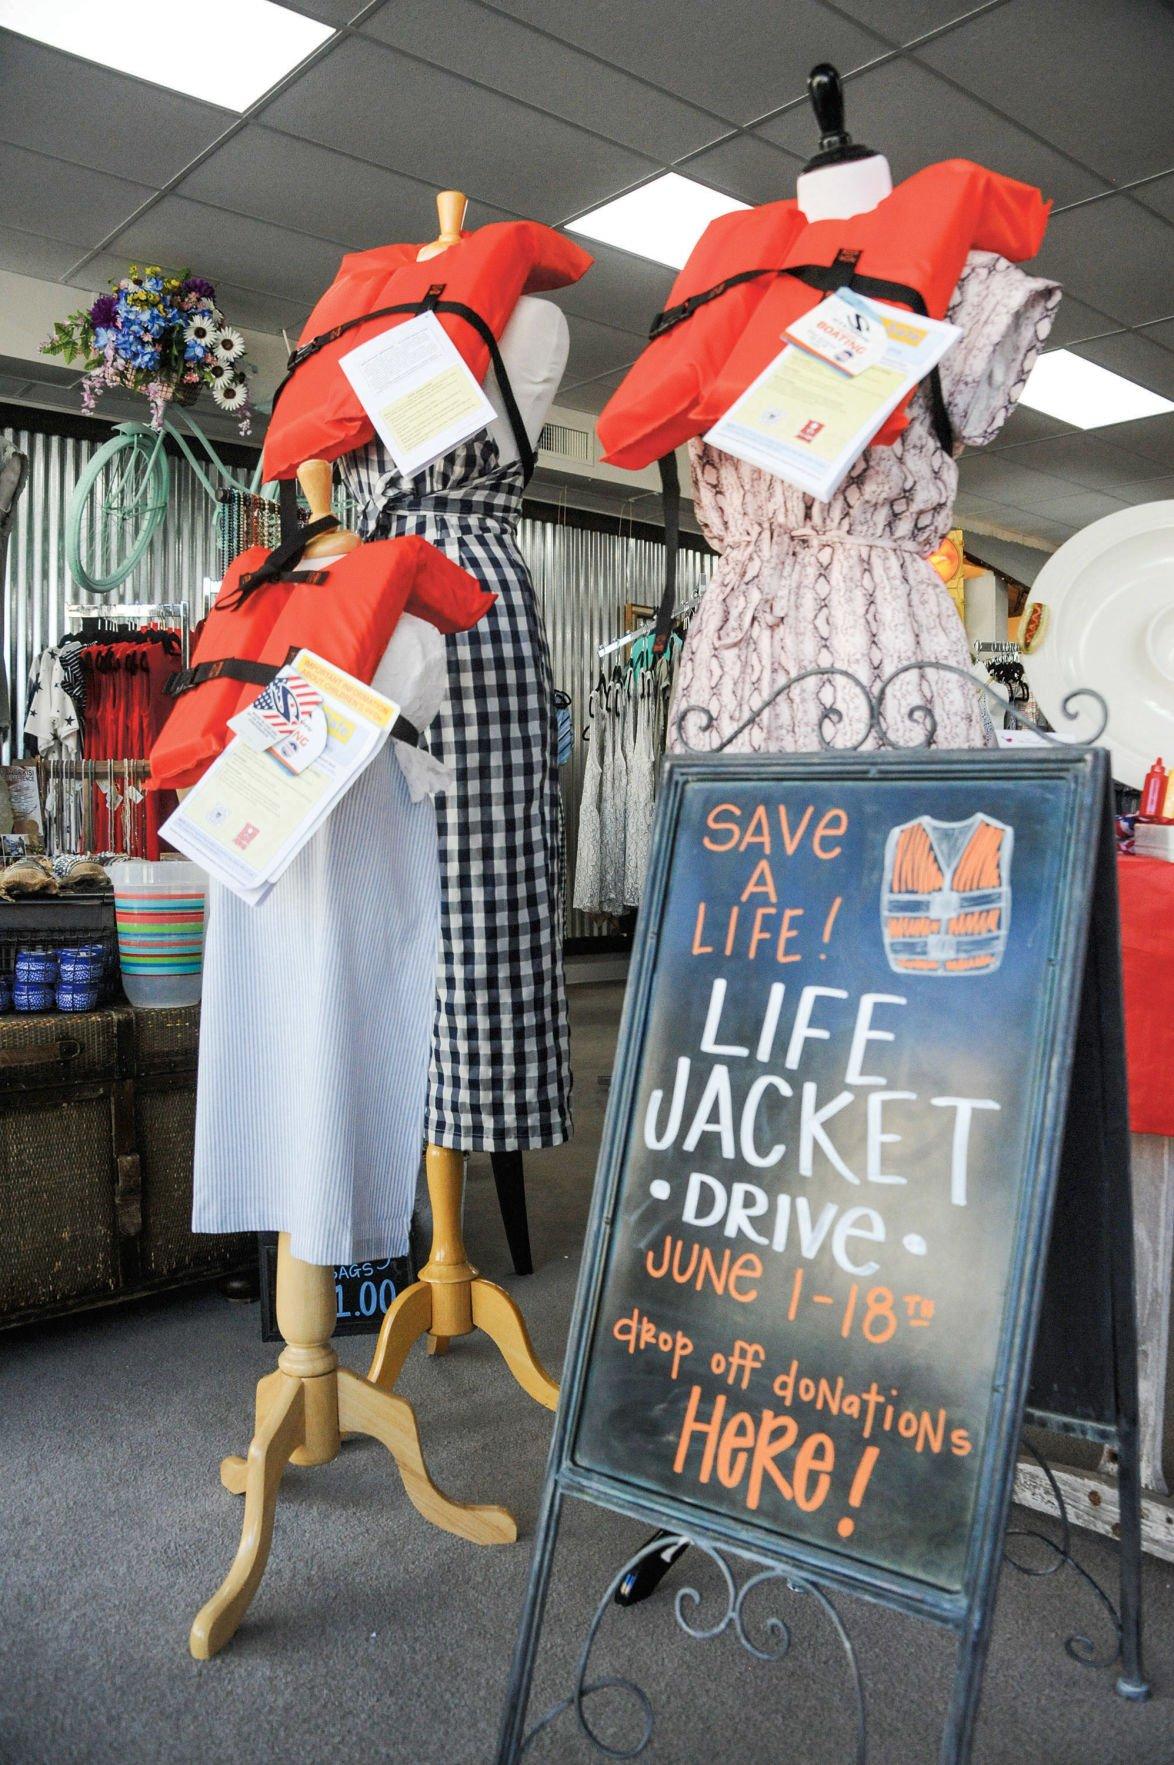 0612 Life jacket donations.jpg